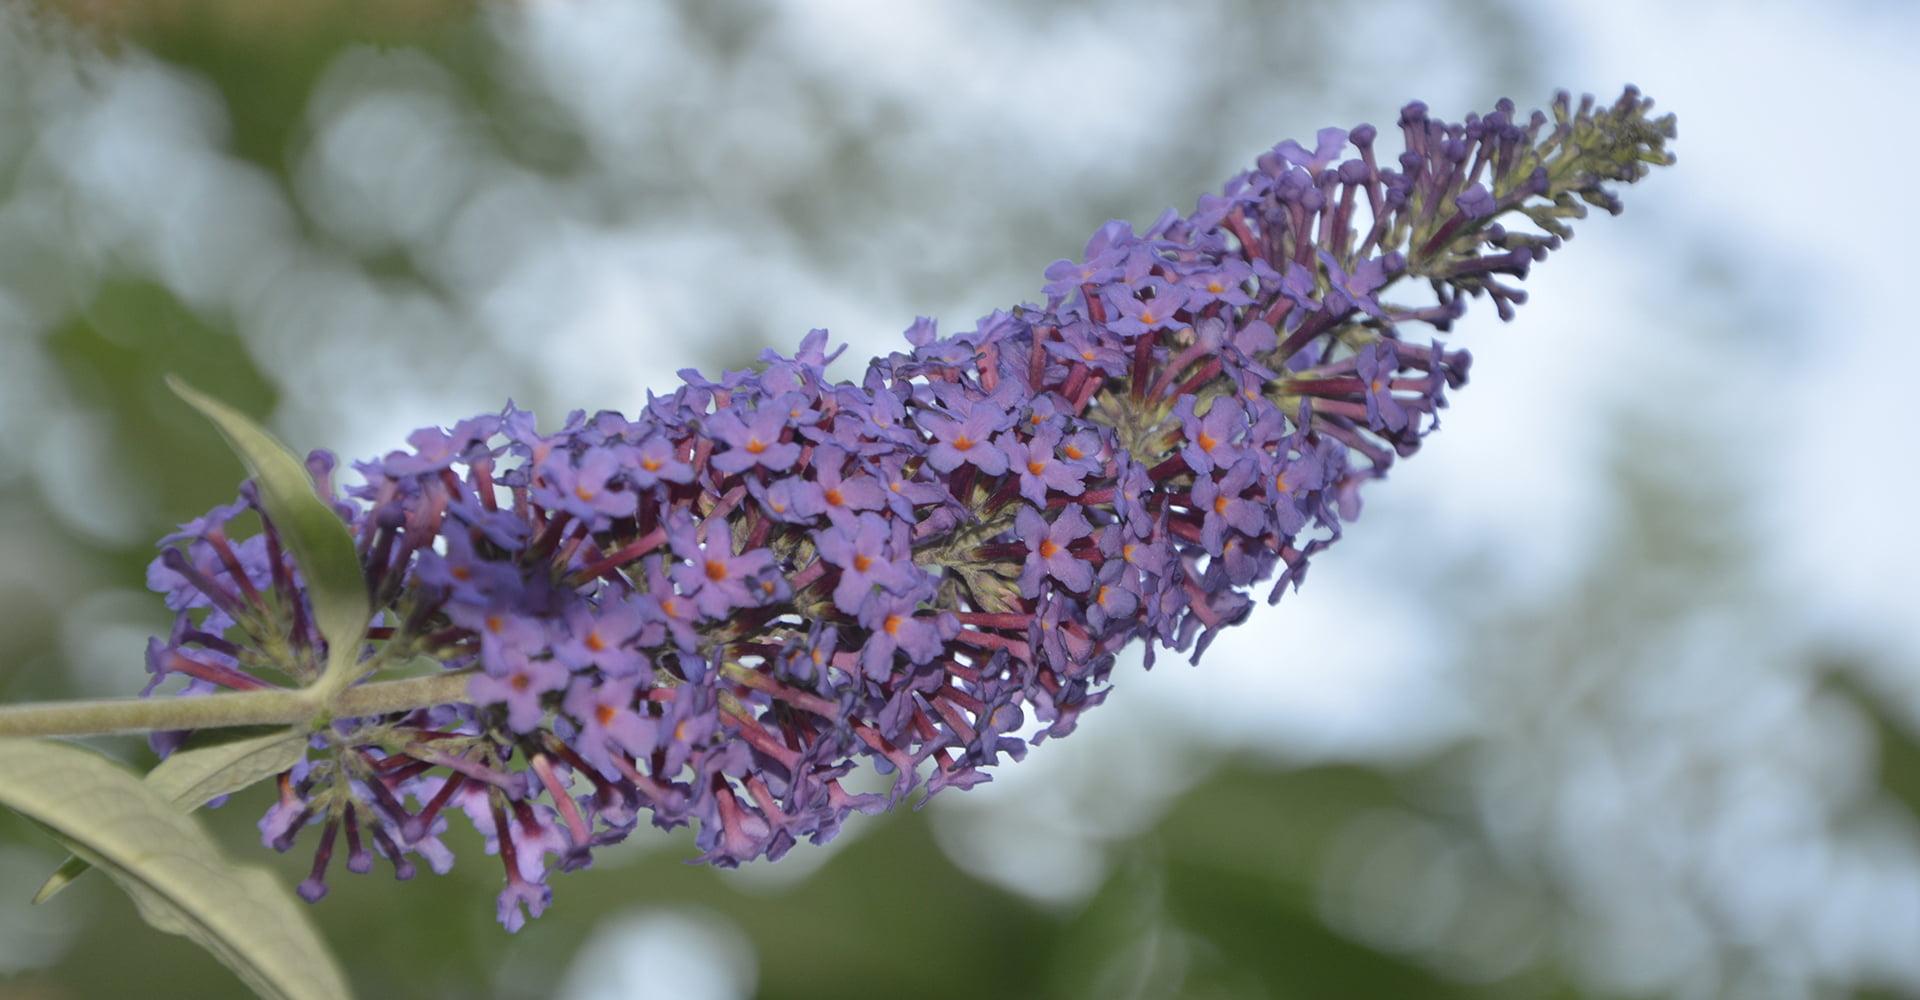 Buddleia Care Guide How To Grow Butterfly Bush Diy Garden